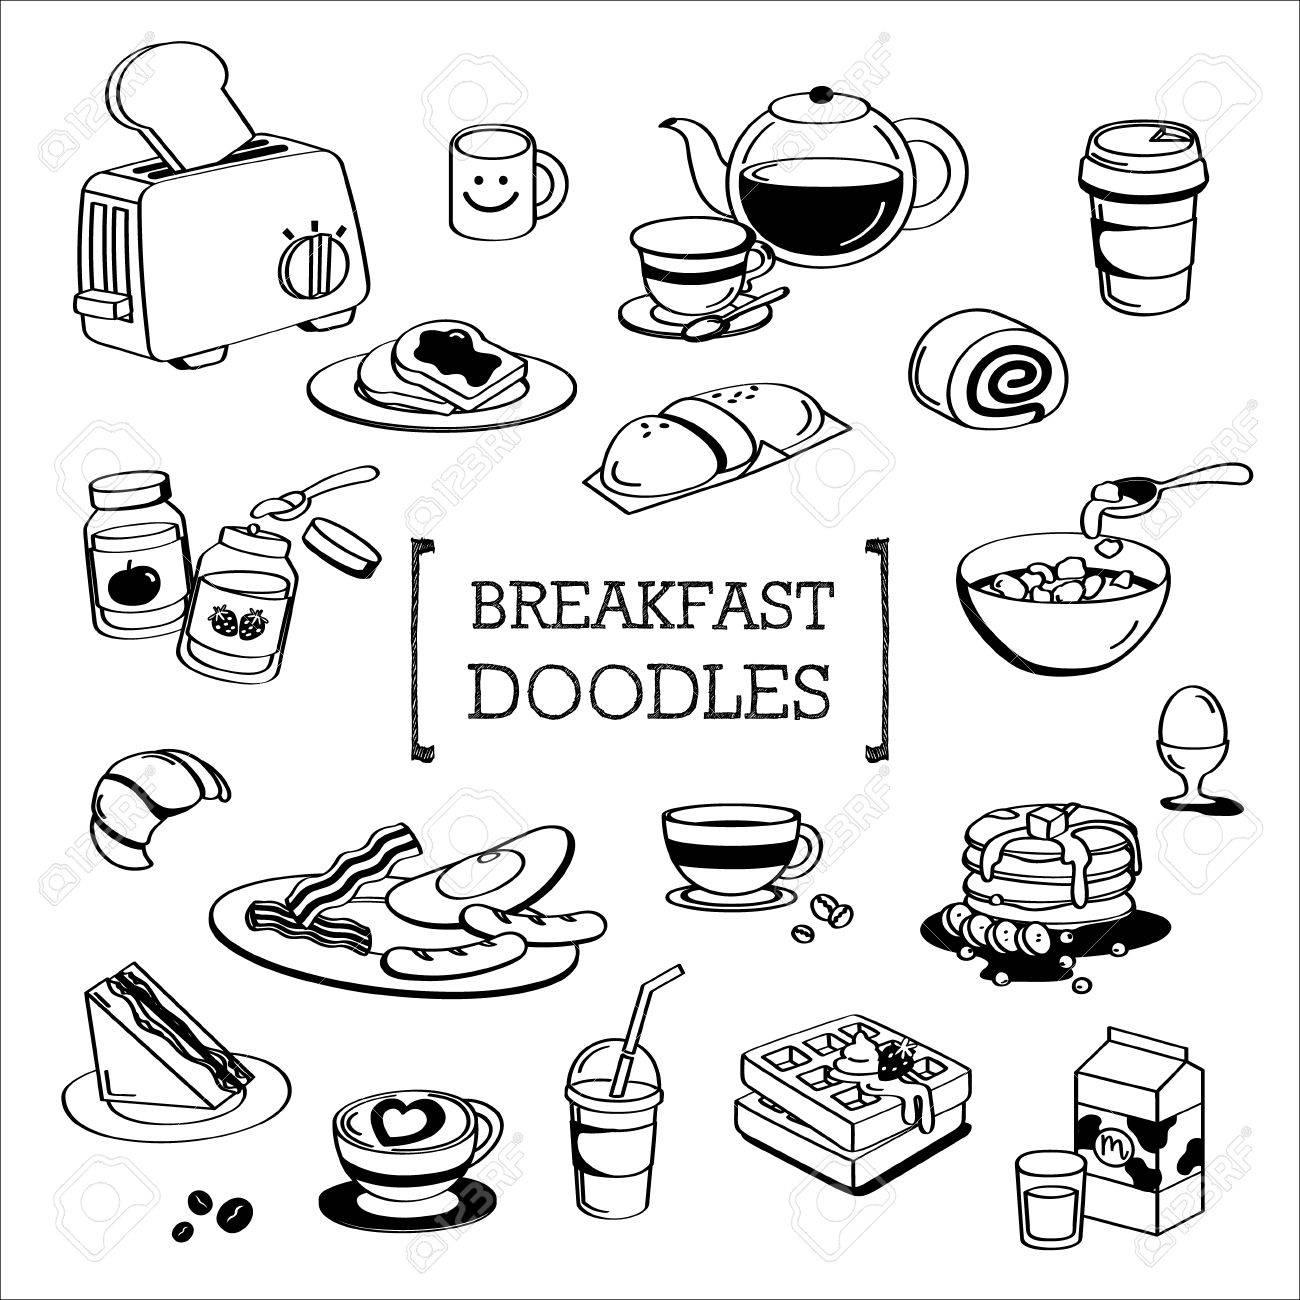 menu du petit dejeuner doodle dessin a la main des styles du menu du petit dejeuner